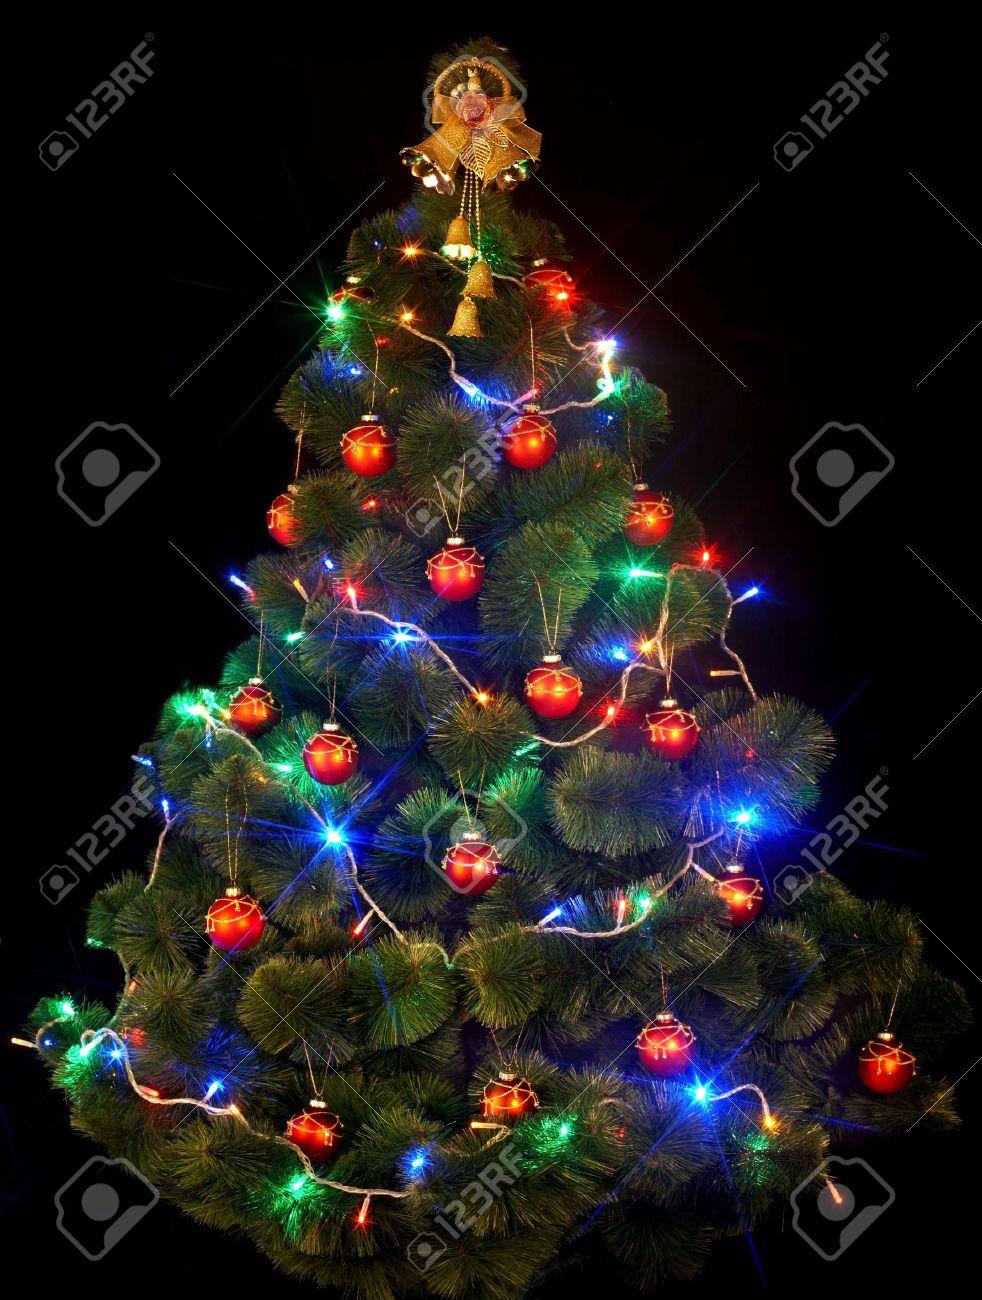 Christmas Tree With Led Light On Black Background